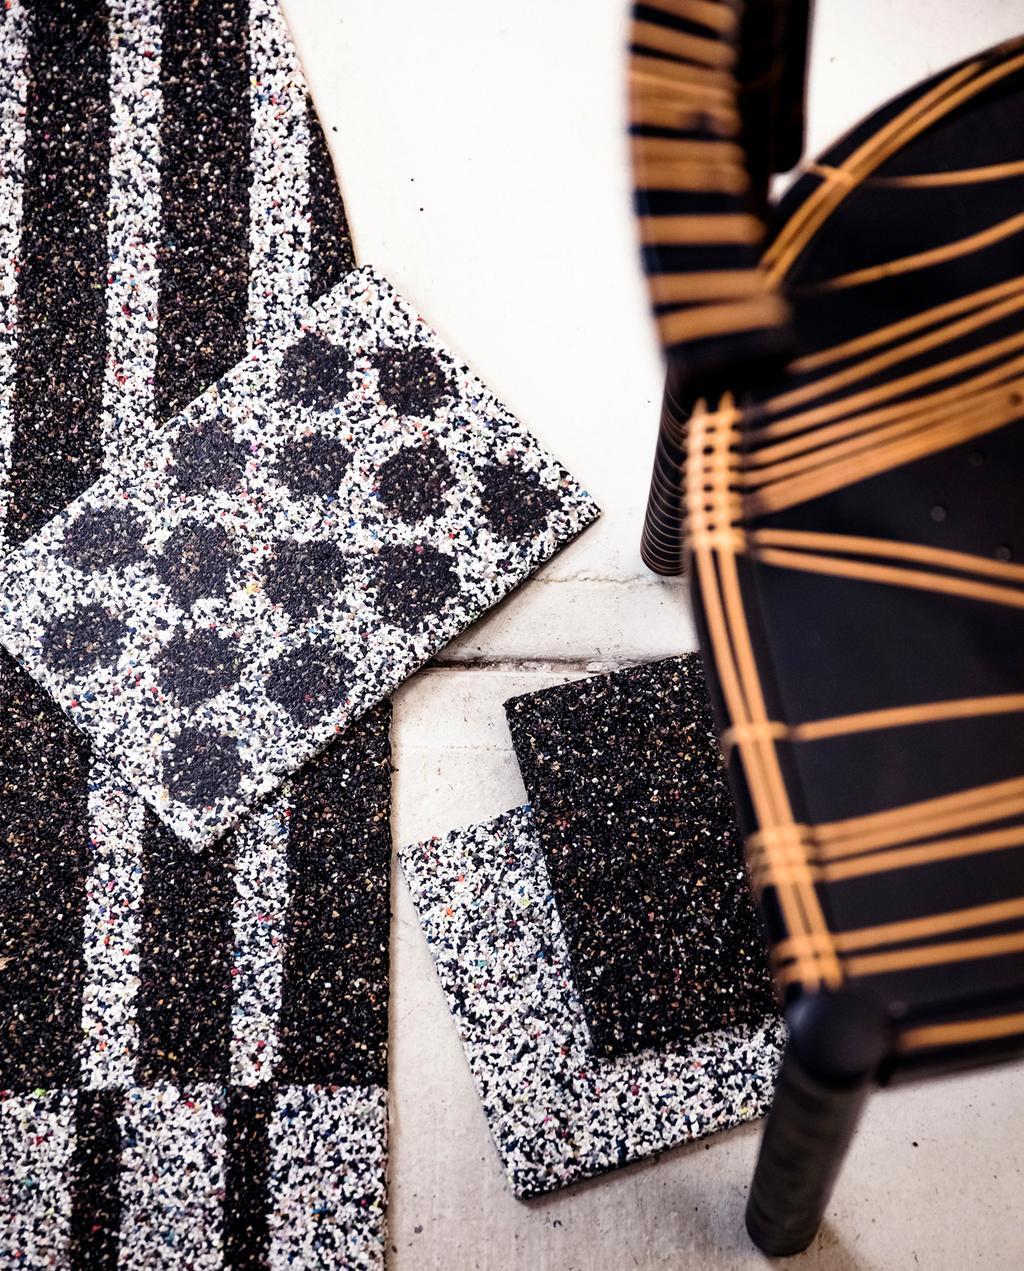 vtwonen 6-2019 | Ambacht Simone atelier stoel en stoffen